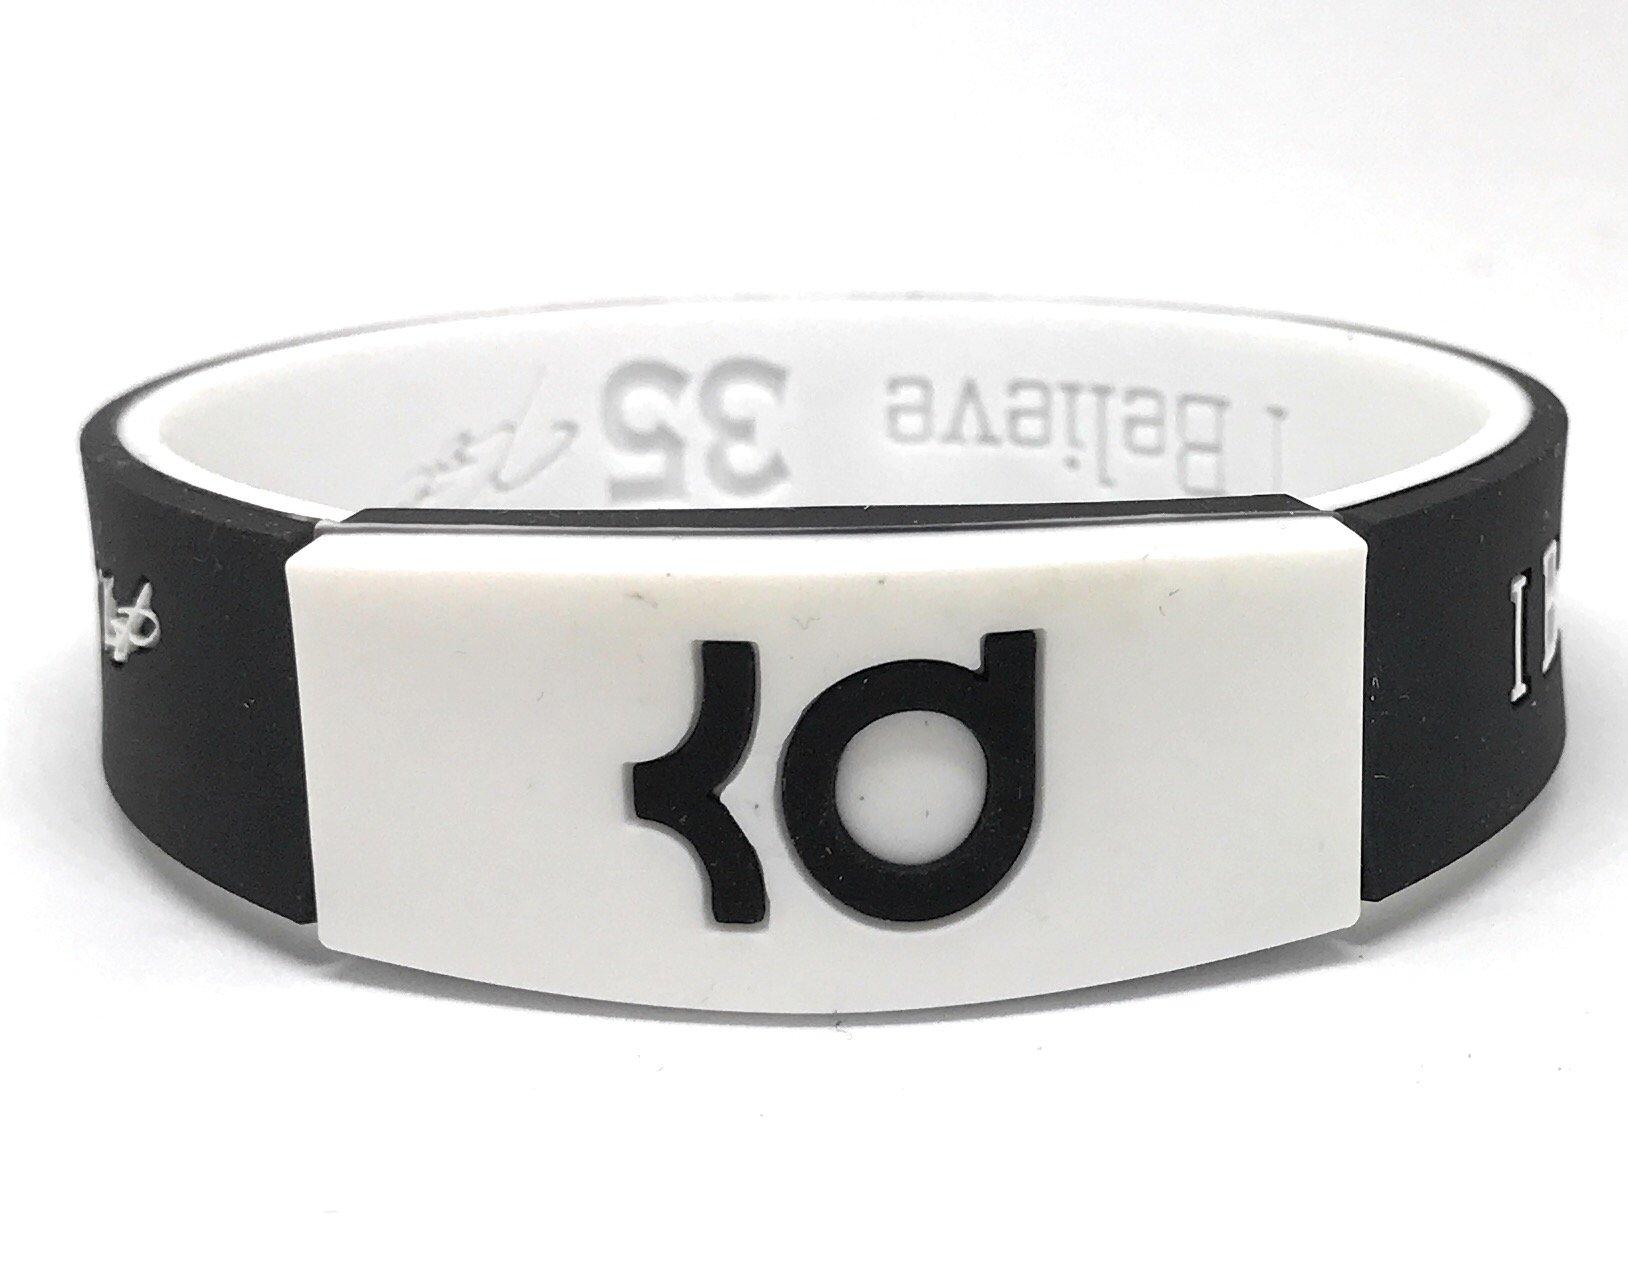 SportsBraceletsPro Reversible Wristband Adult/Teen 7.7'' Size Bracelets (Durant Black/White)